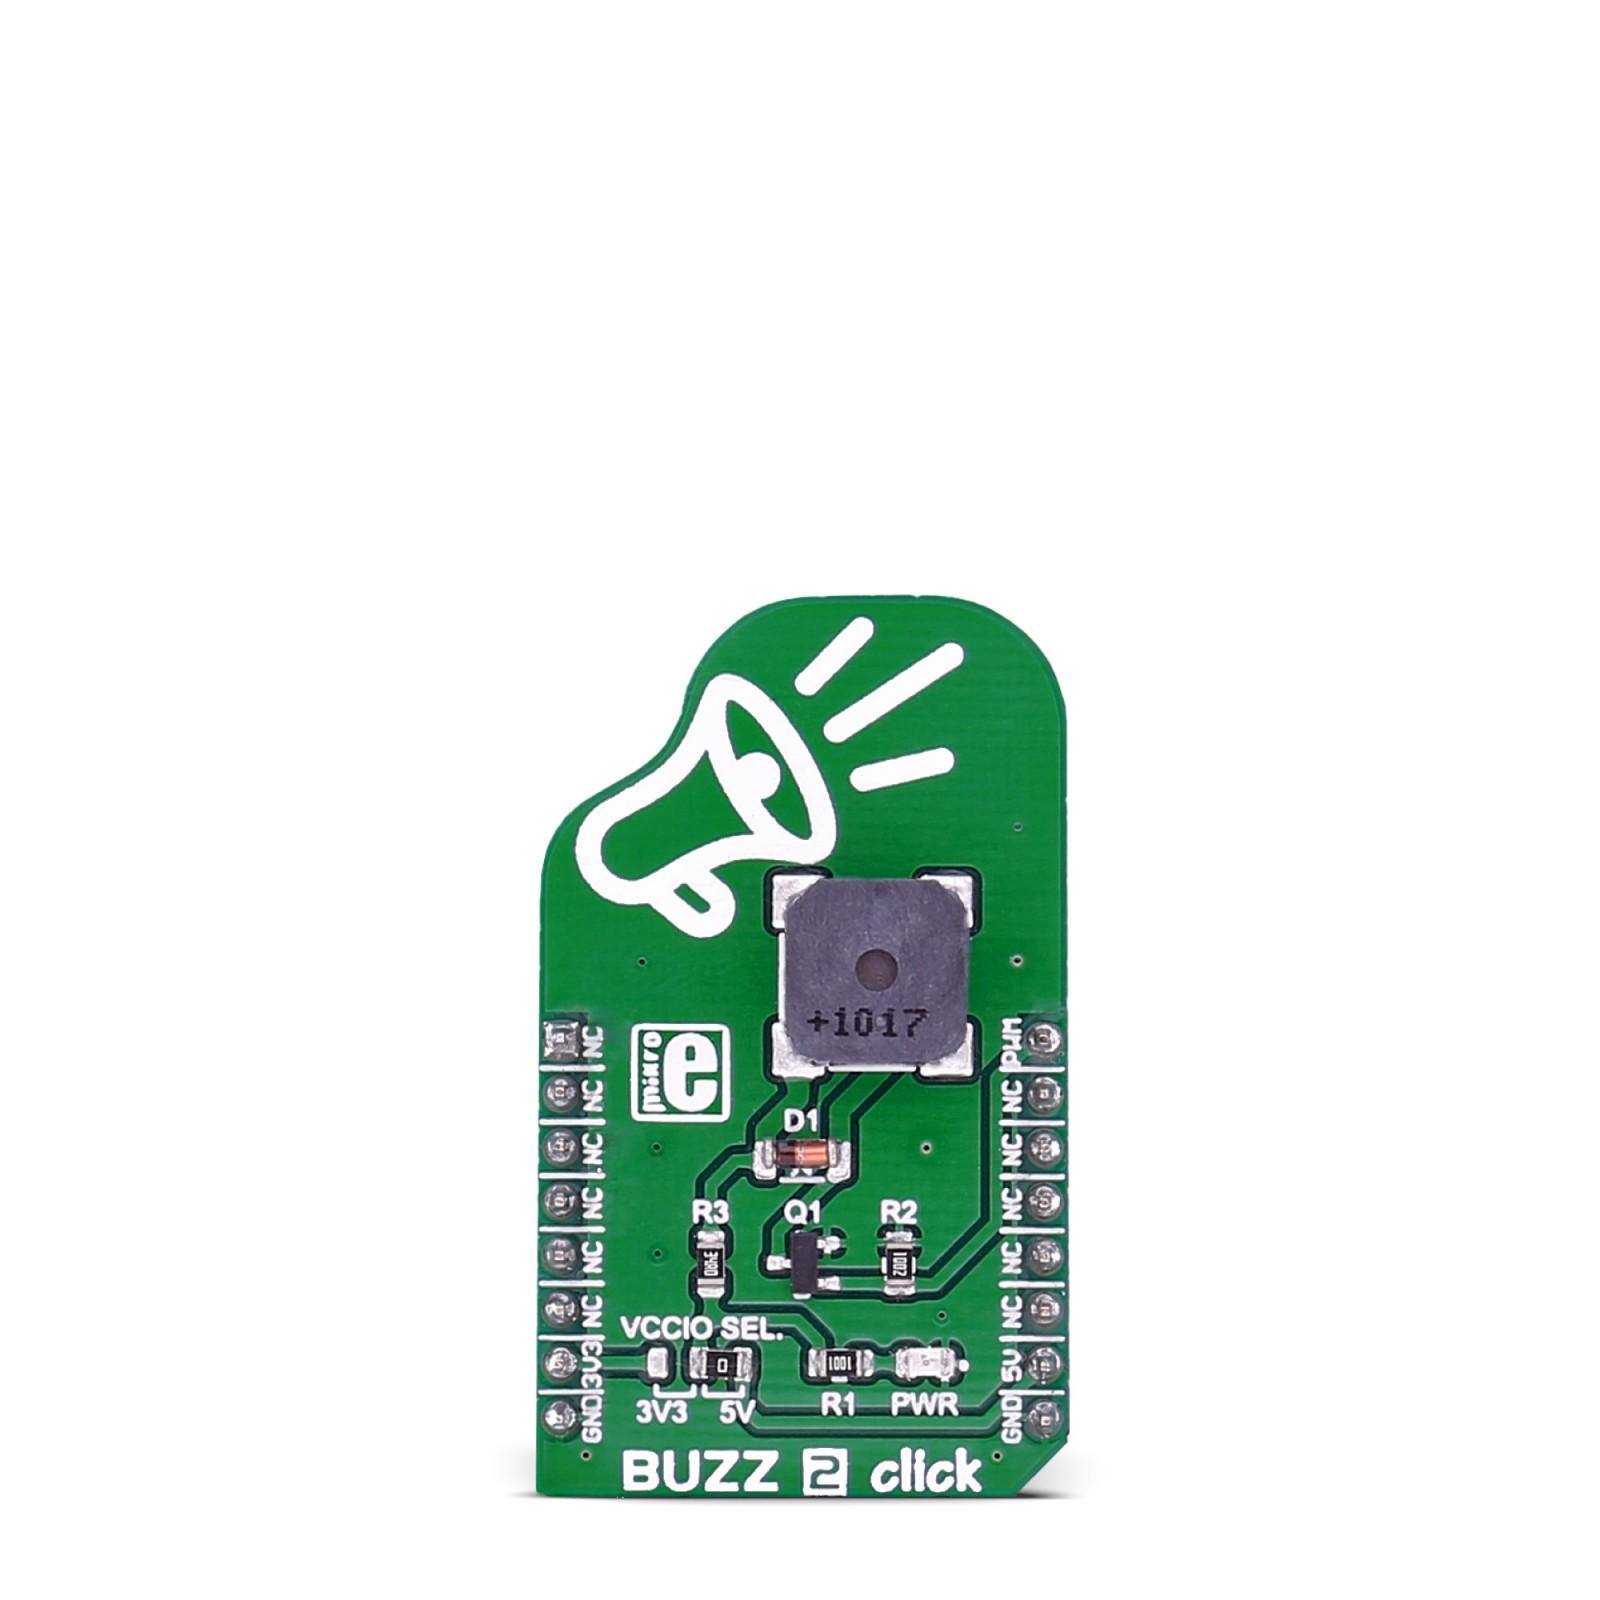 Buzz 2 Click Board With Cmt 8540s Smt Magnetic Buzzer Wiring Diagram Mgctlbxnmzp Mgctlbxv5112 Mgctlbxlc Mgctlbxpprestashop